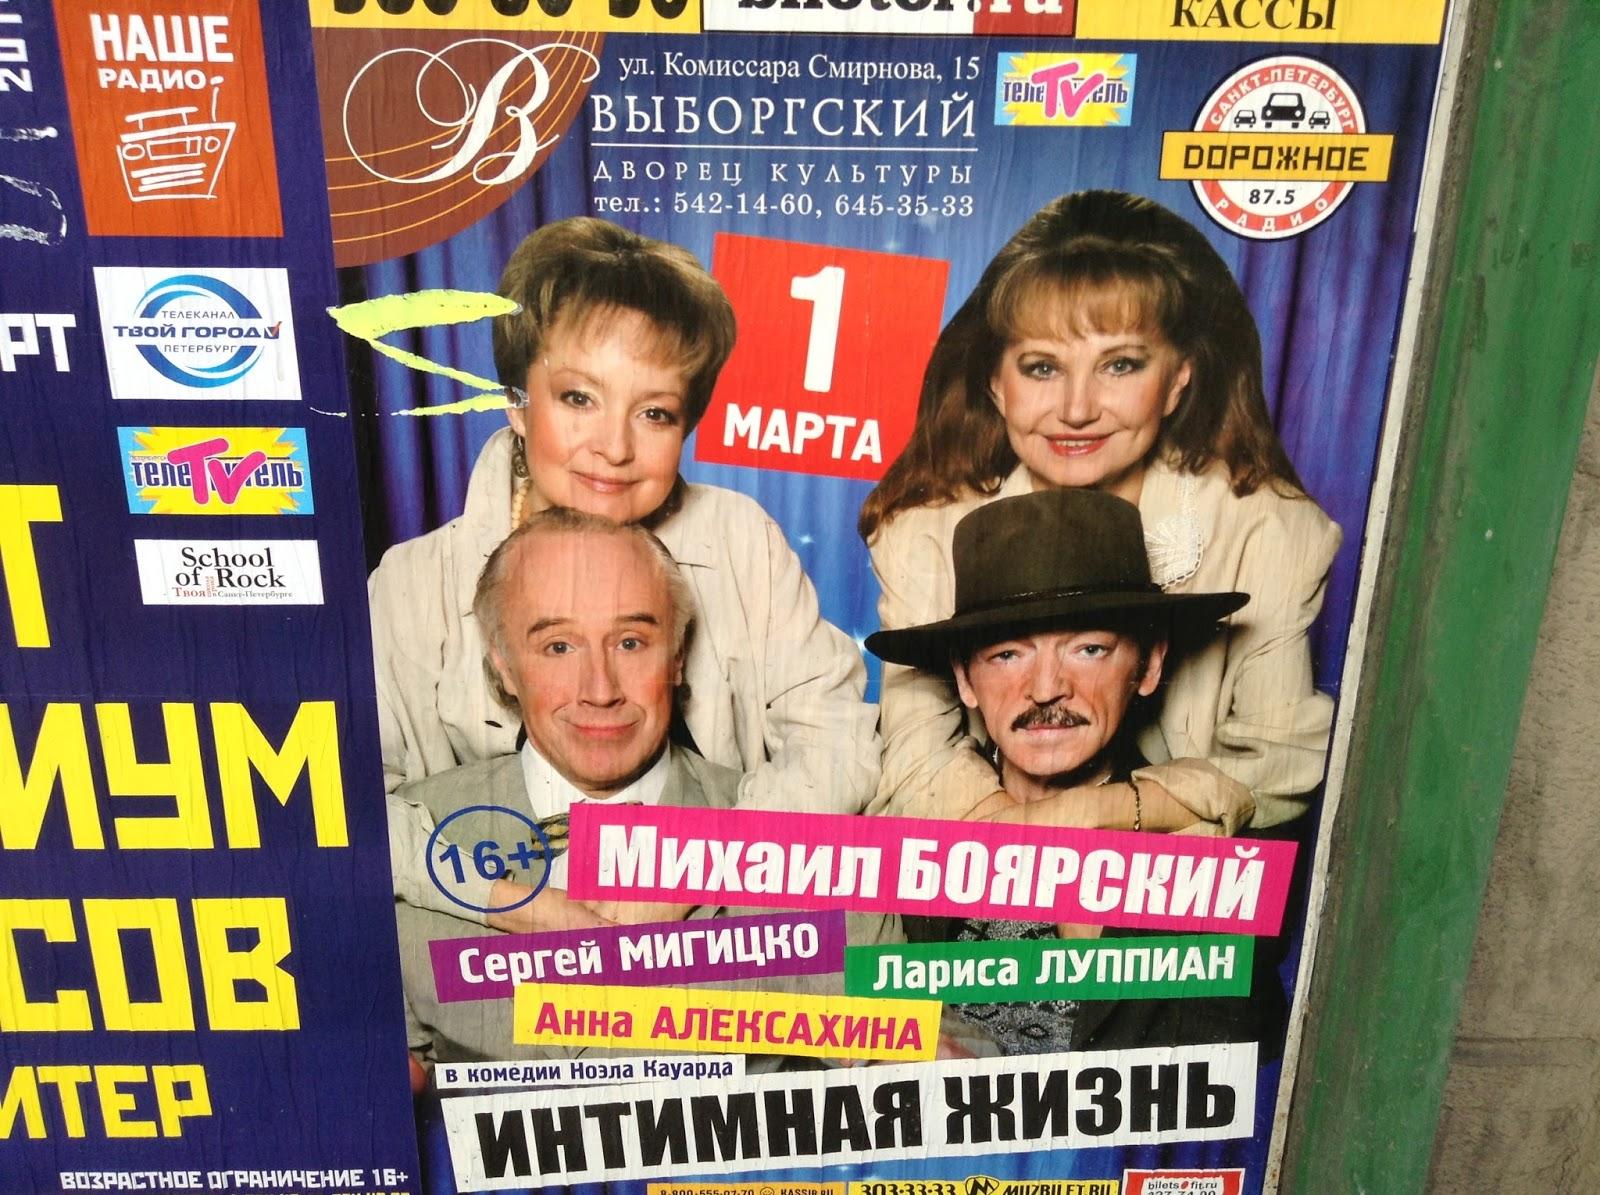 muzika-iz-spektaklya-intimnaya-zhizn